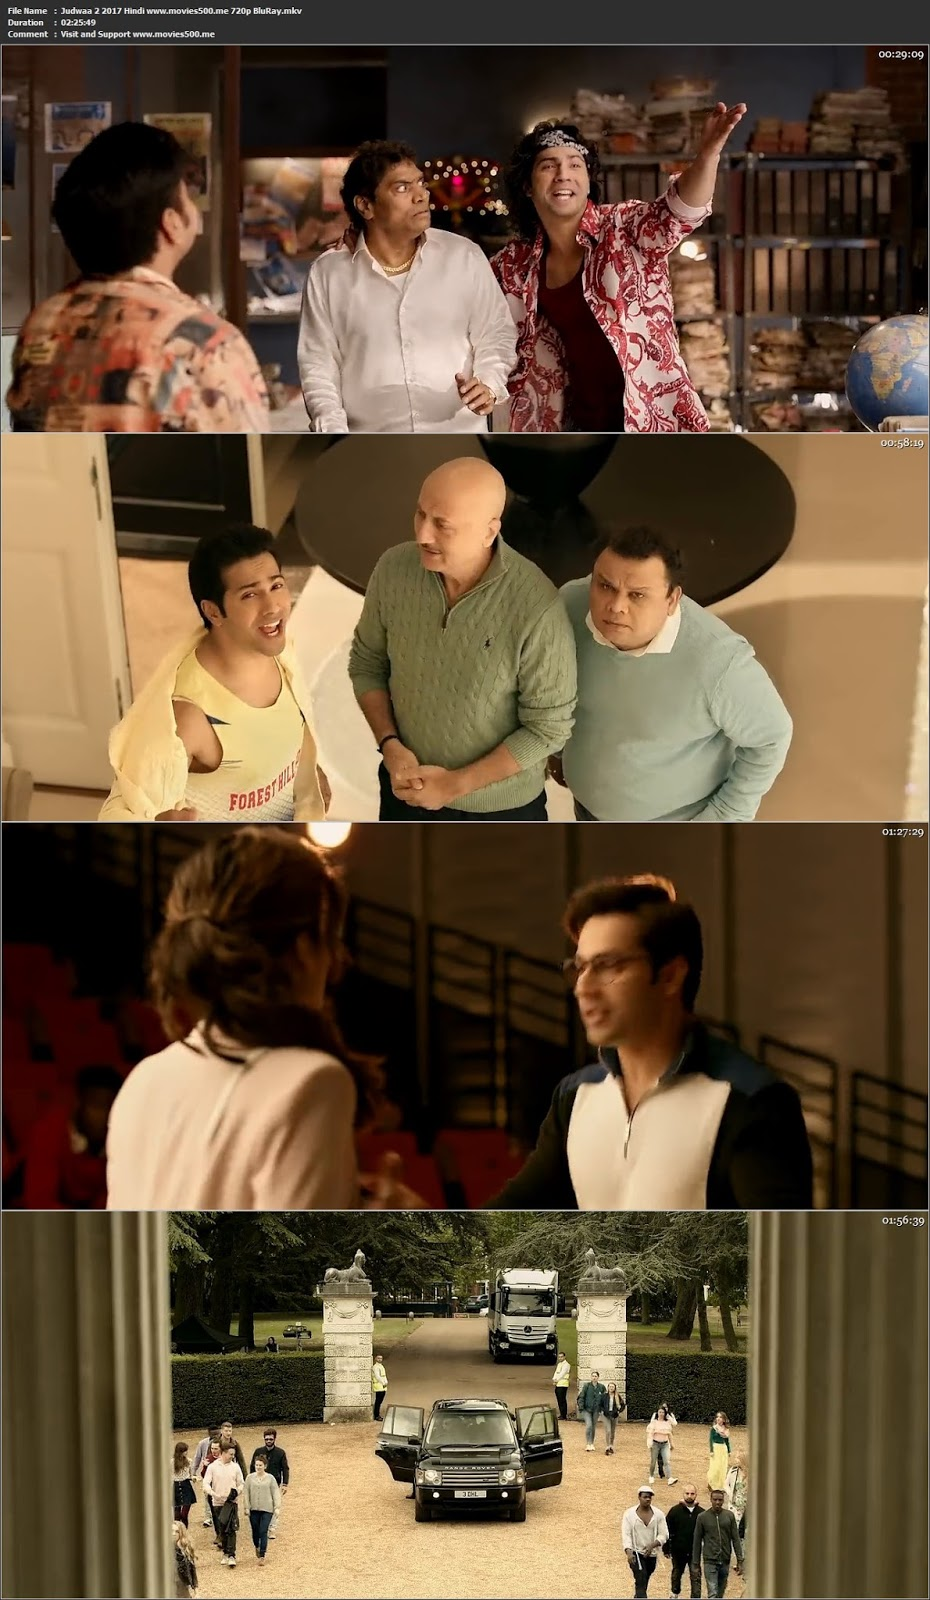 Judwaa 2 2017 Hindi Full Movie BluRay 720p 1GB at xn--o9jyb9aa09c103qnhe3m5i.com